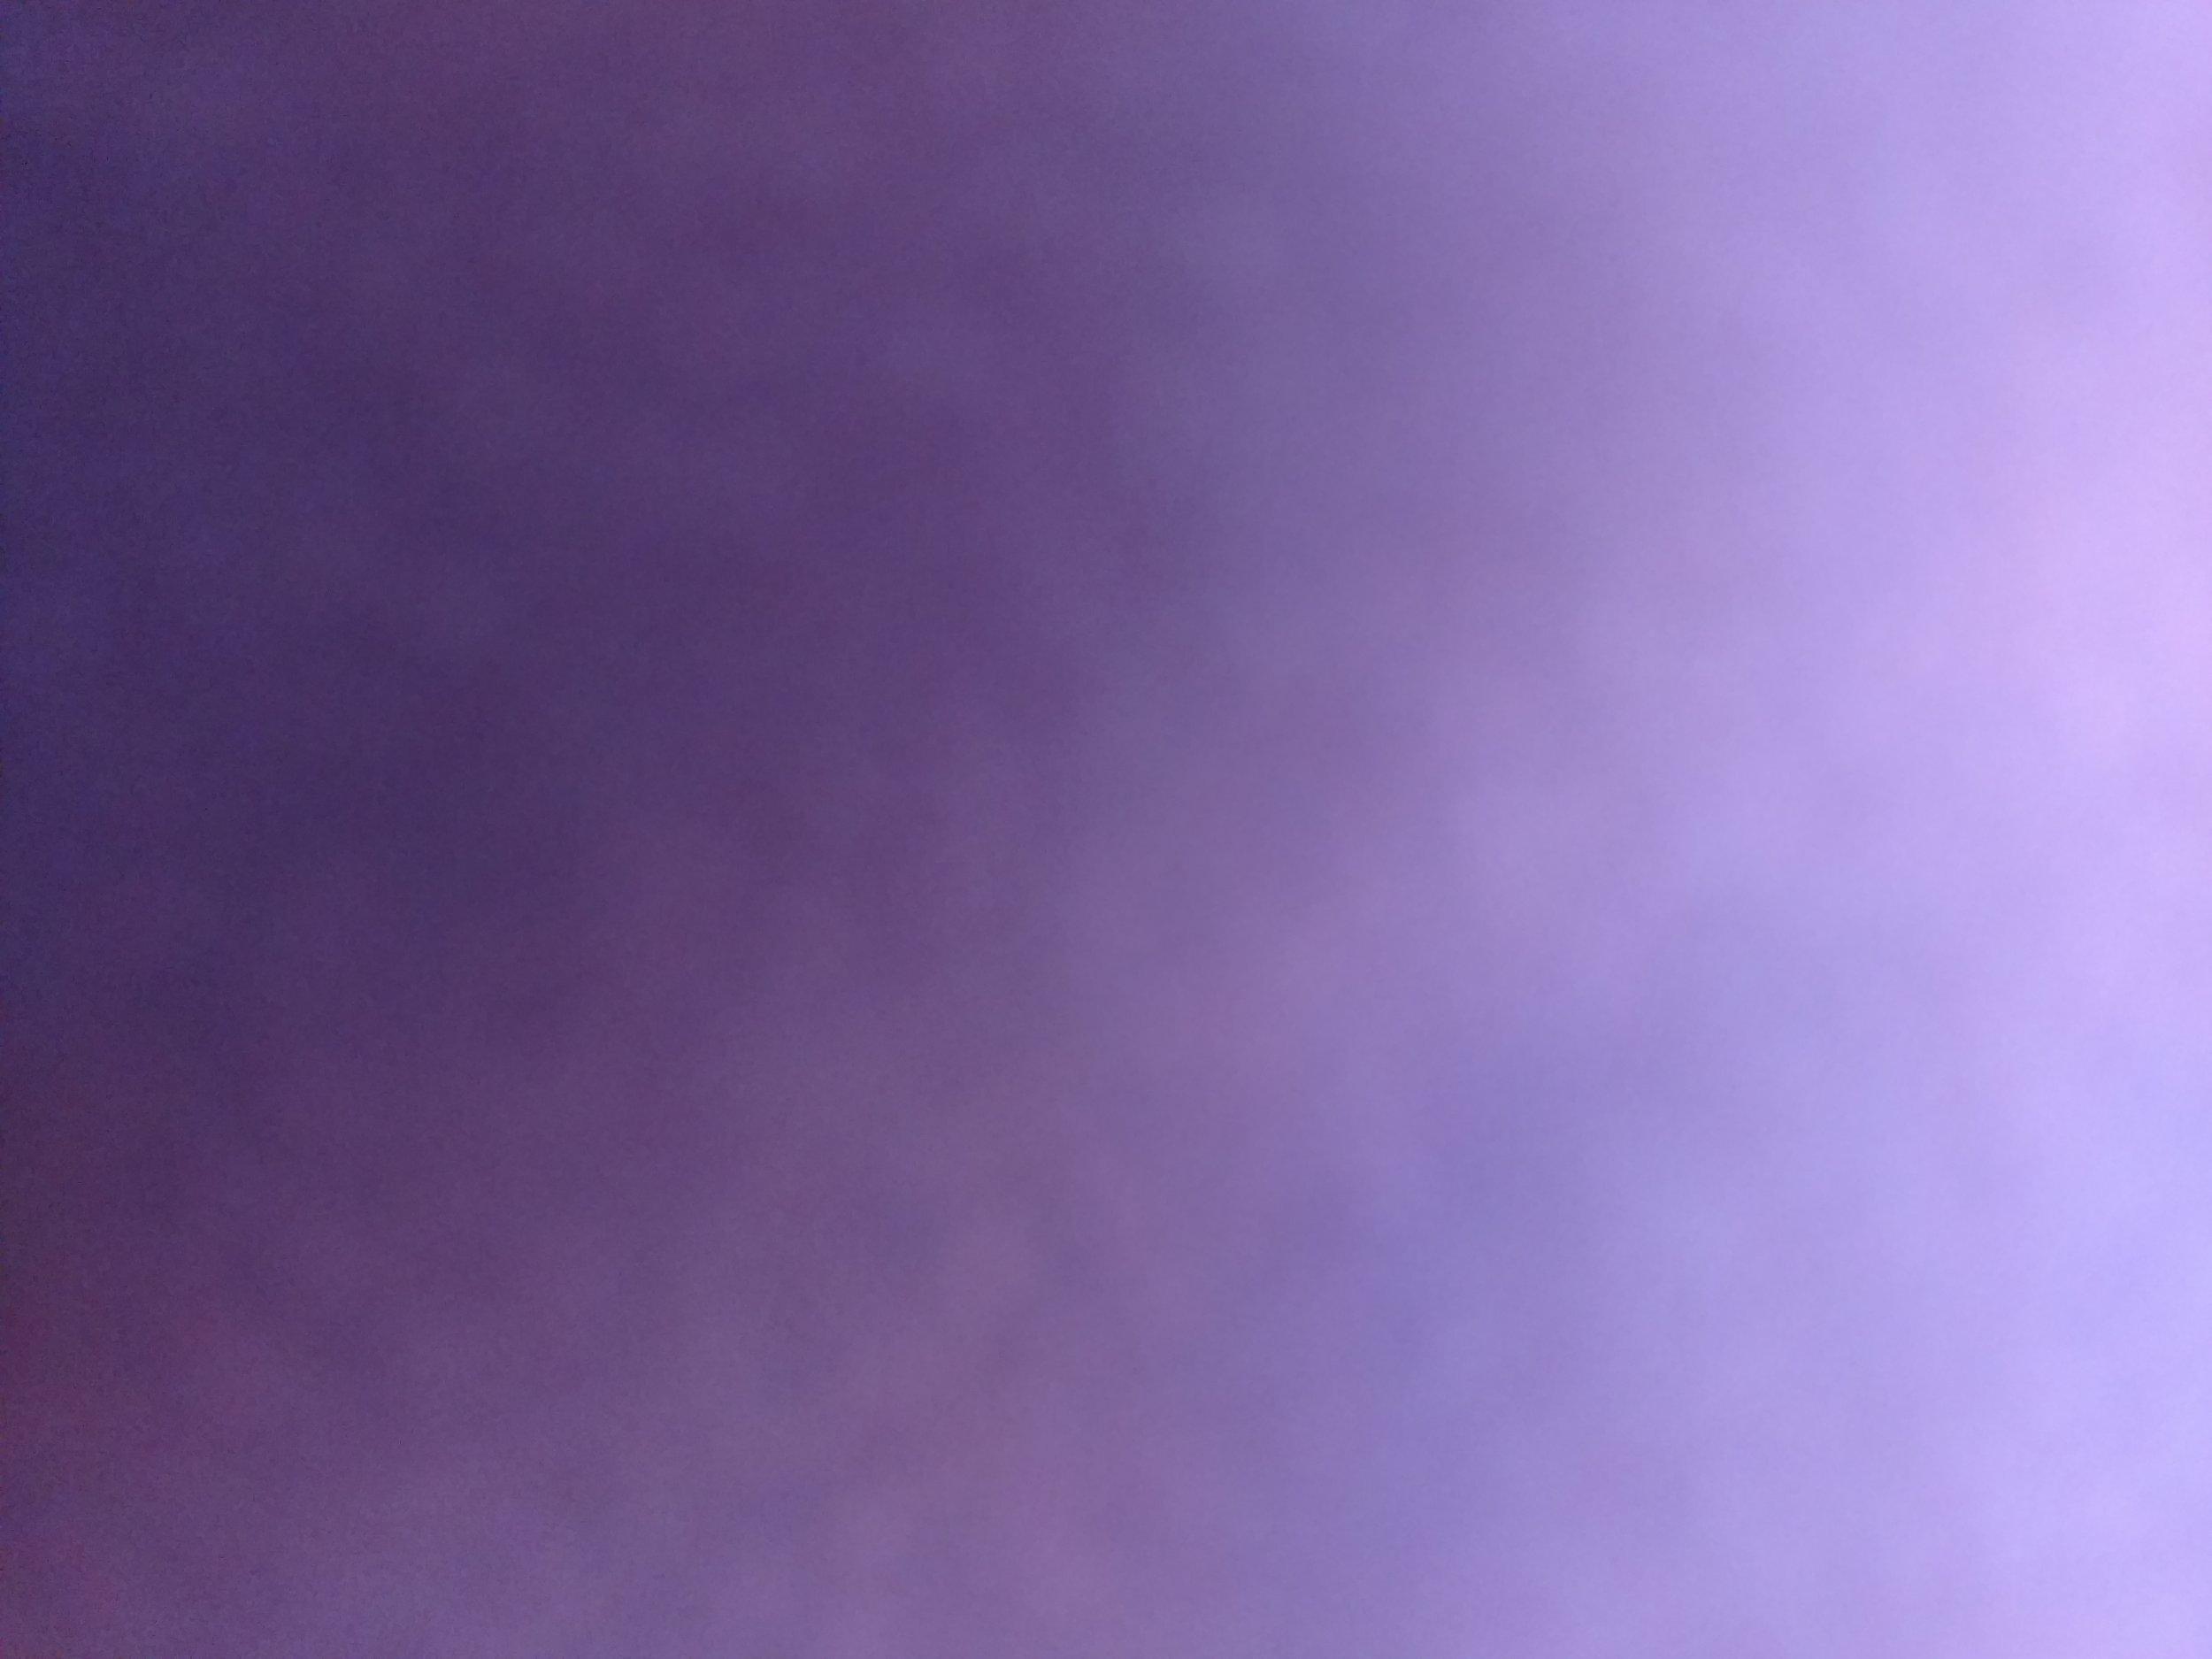 willroth-co-free-texture-gradient-013.jpg